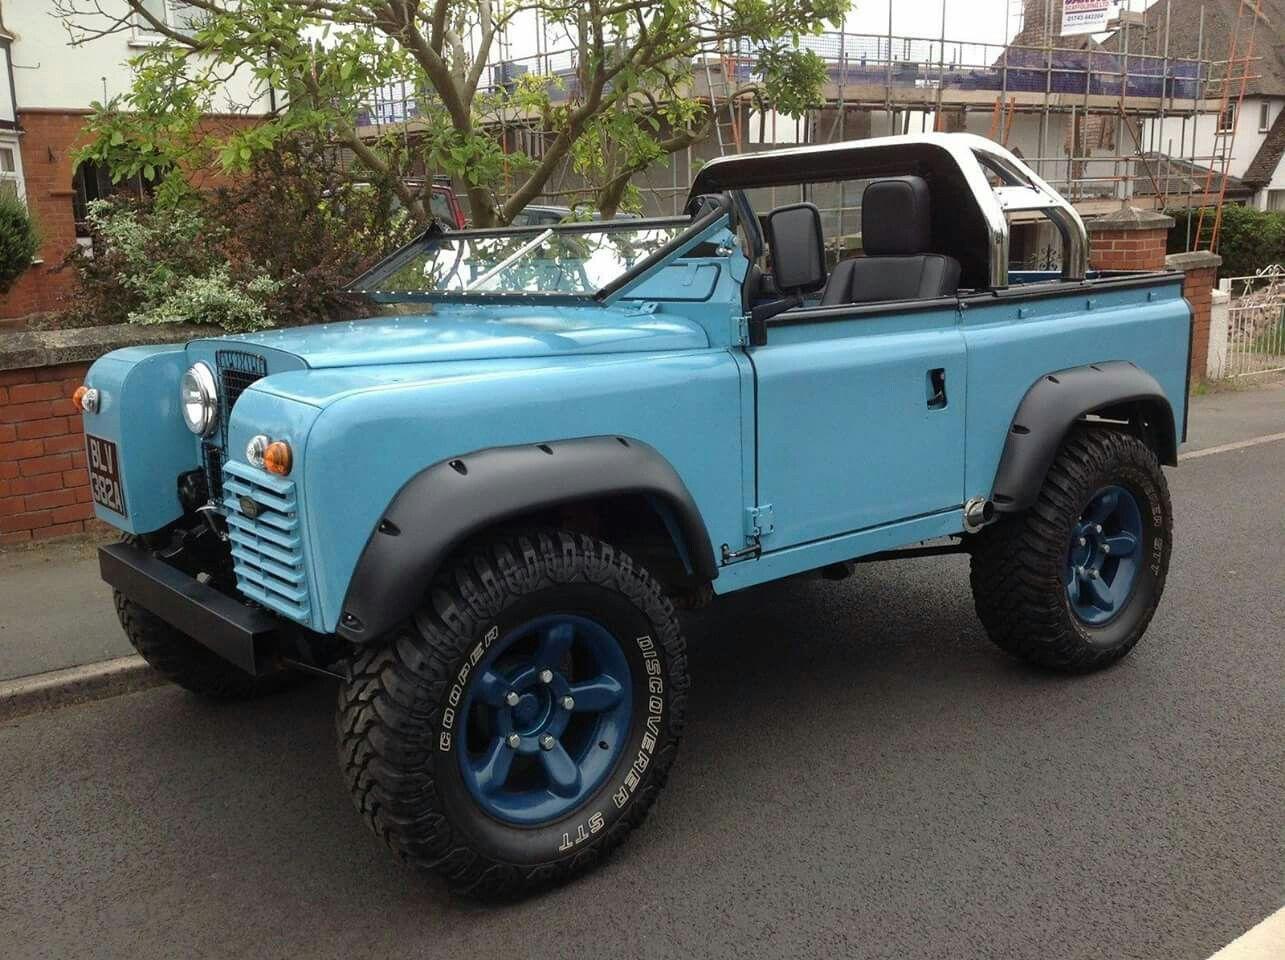 1959 Rebuild Land Rover Defender Land Rover Land Rover Serie 1